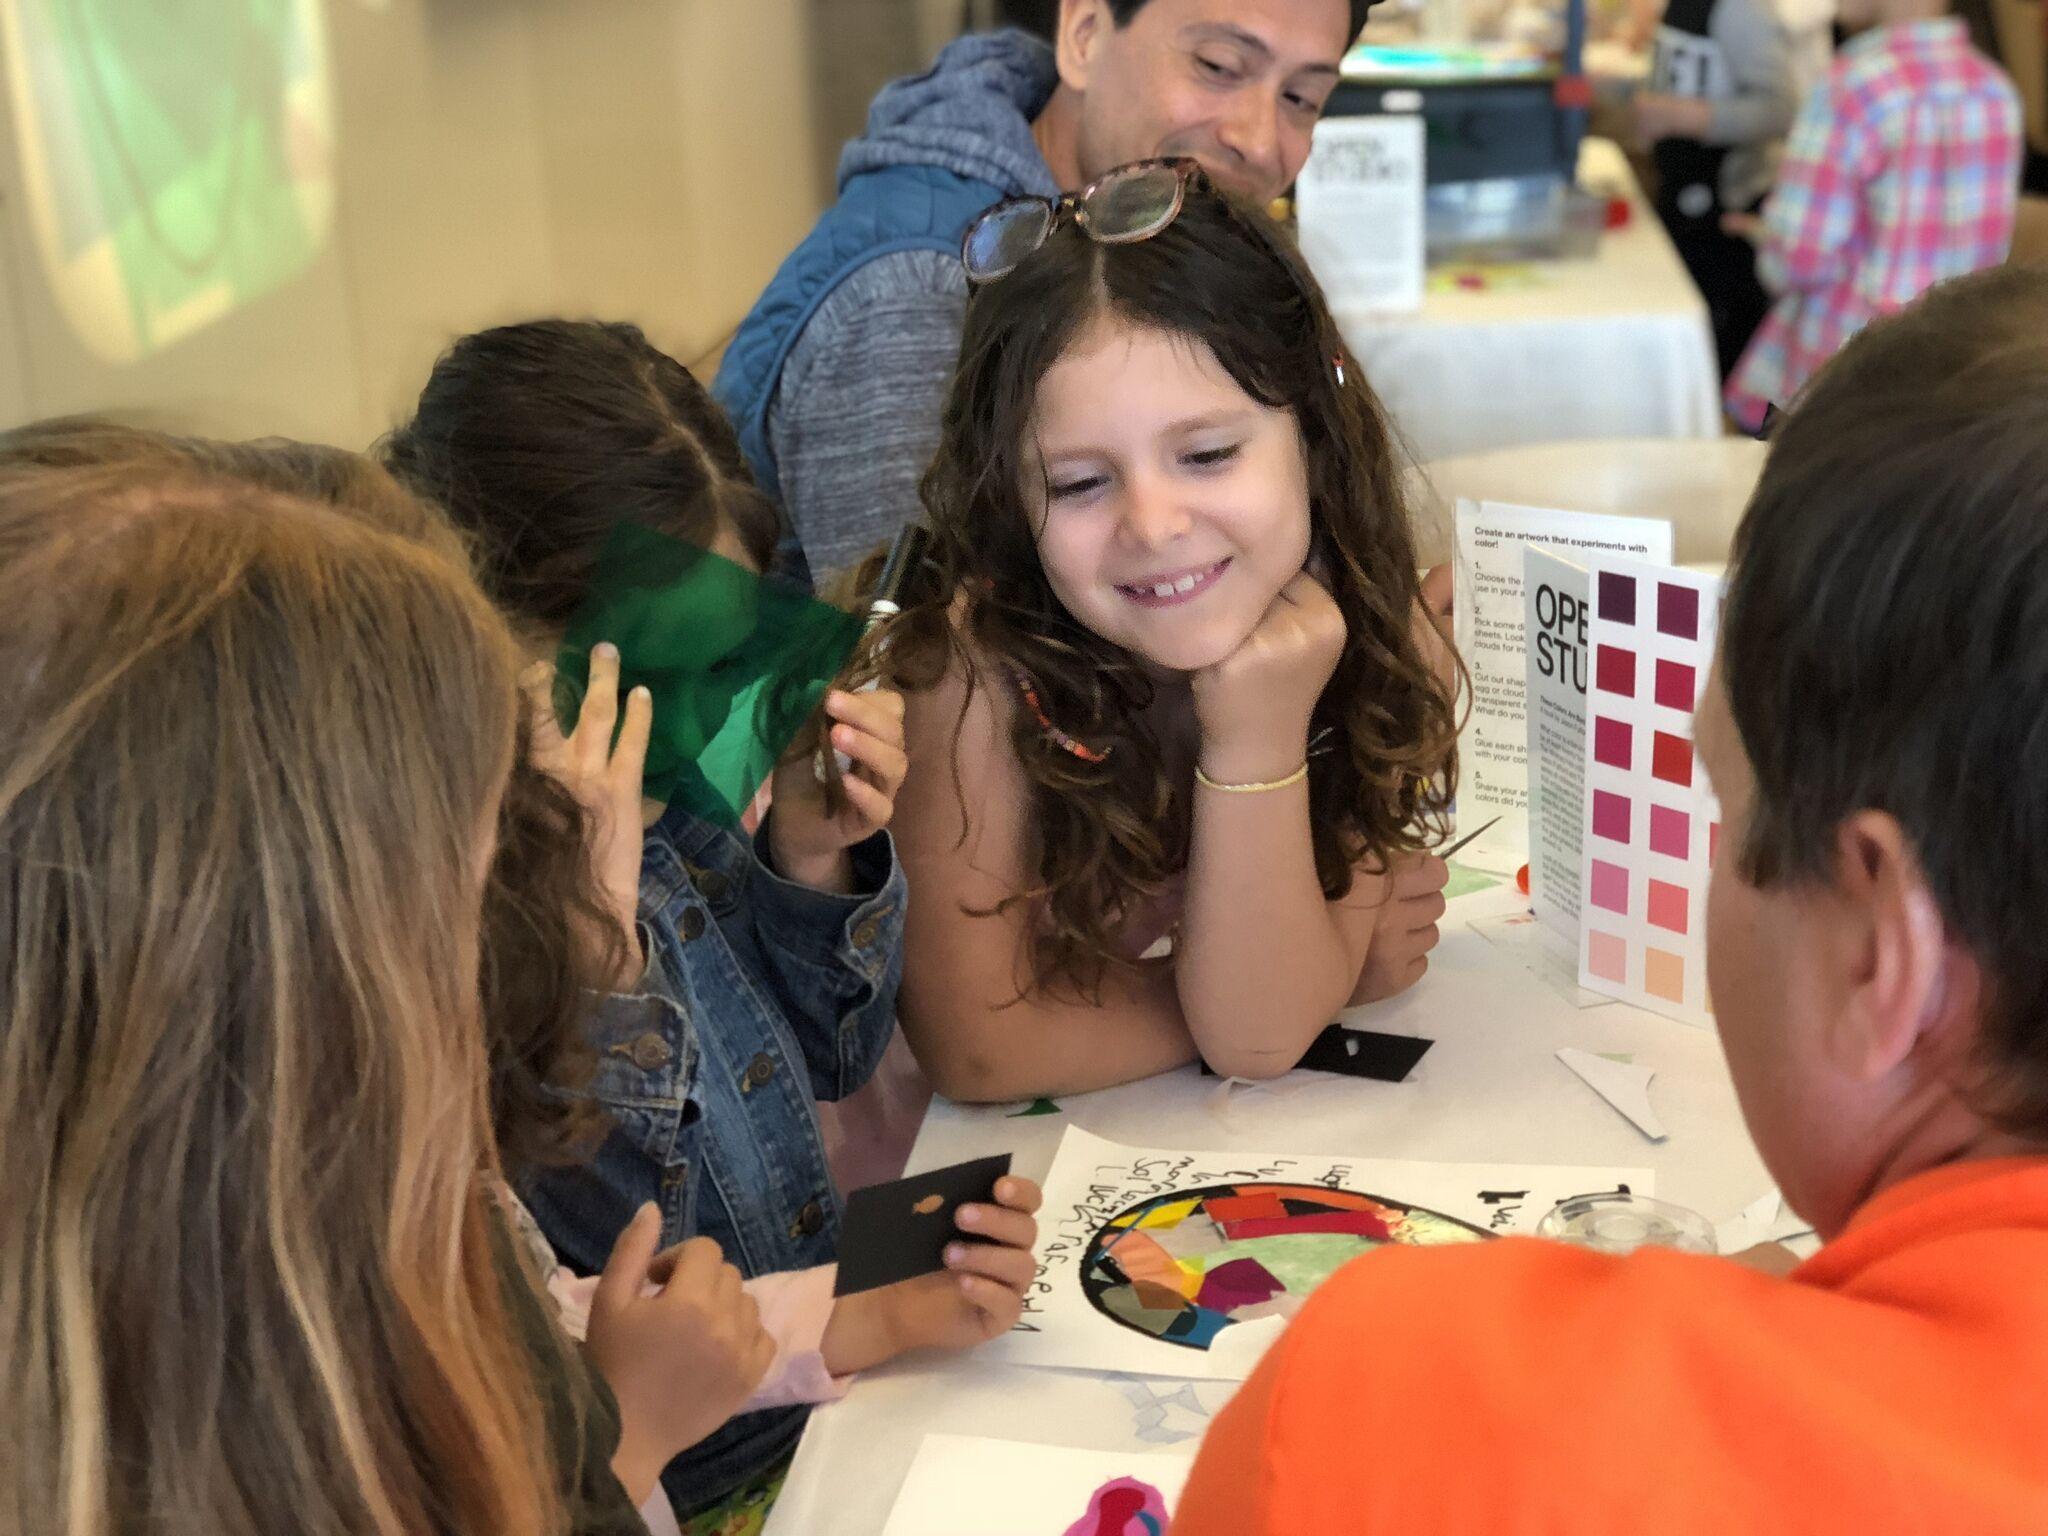 Families making art in Open Studio